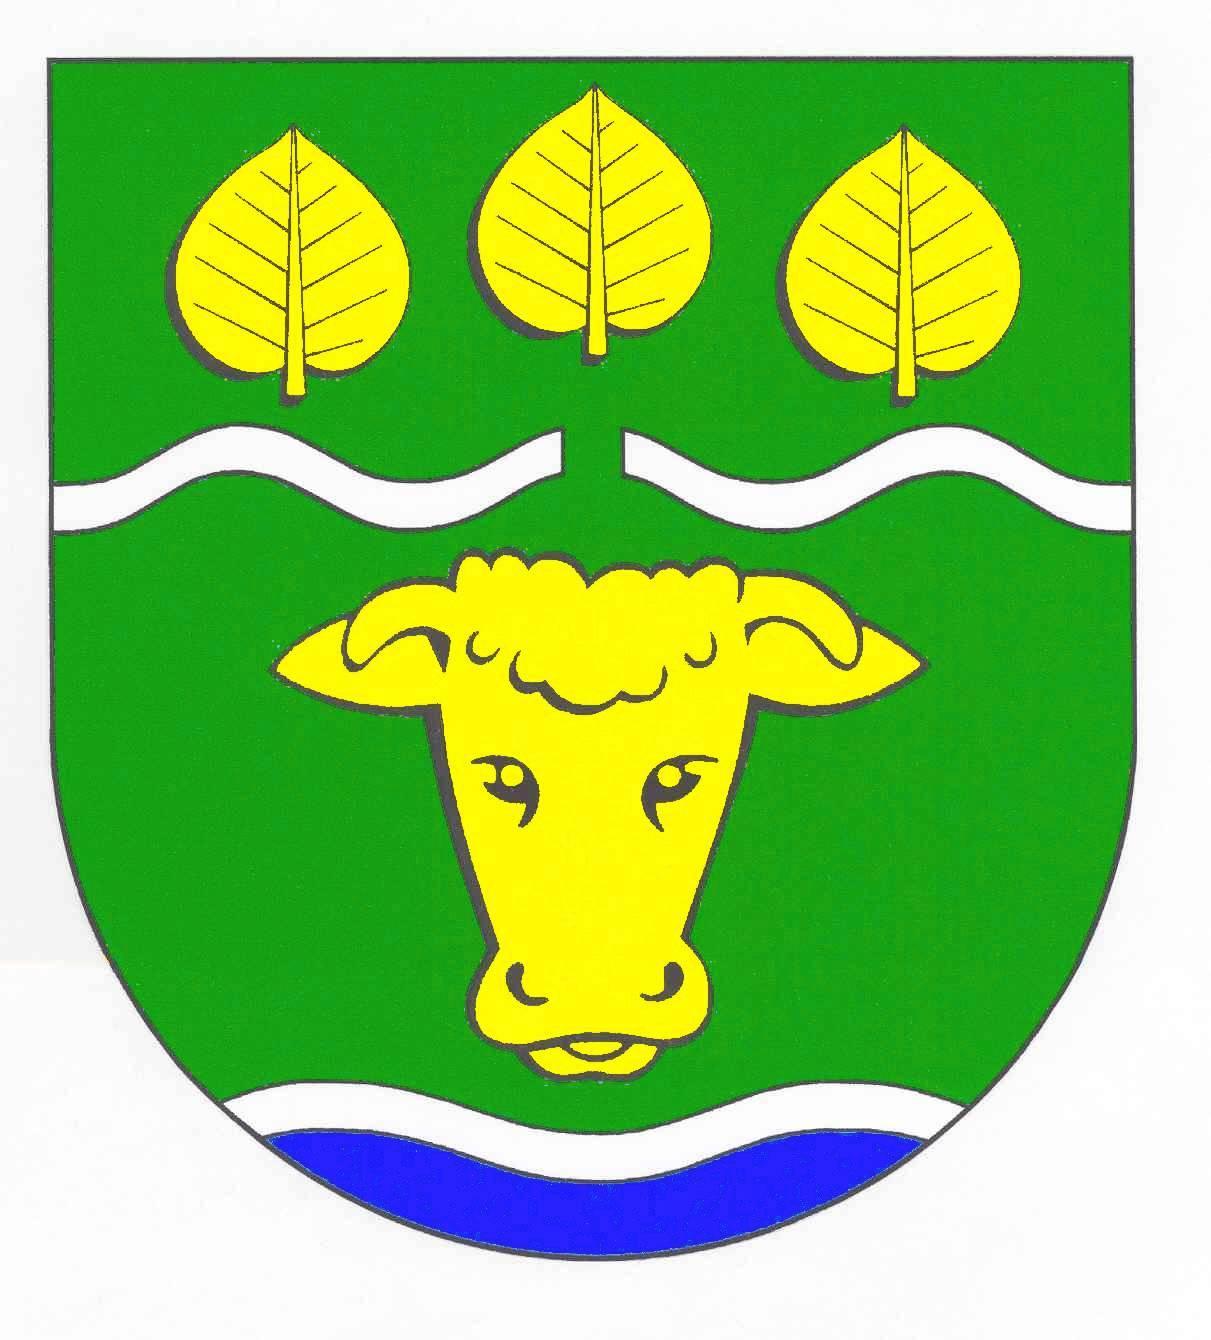 Wappen GemeindeWittbek, Kreis Nordfriesland